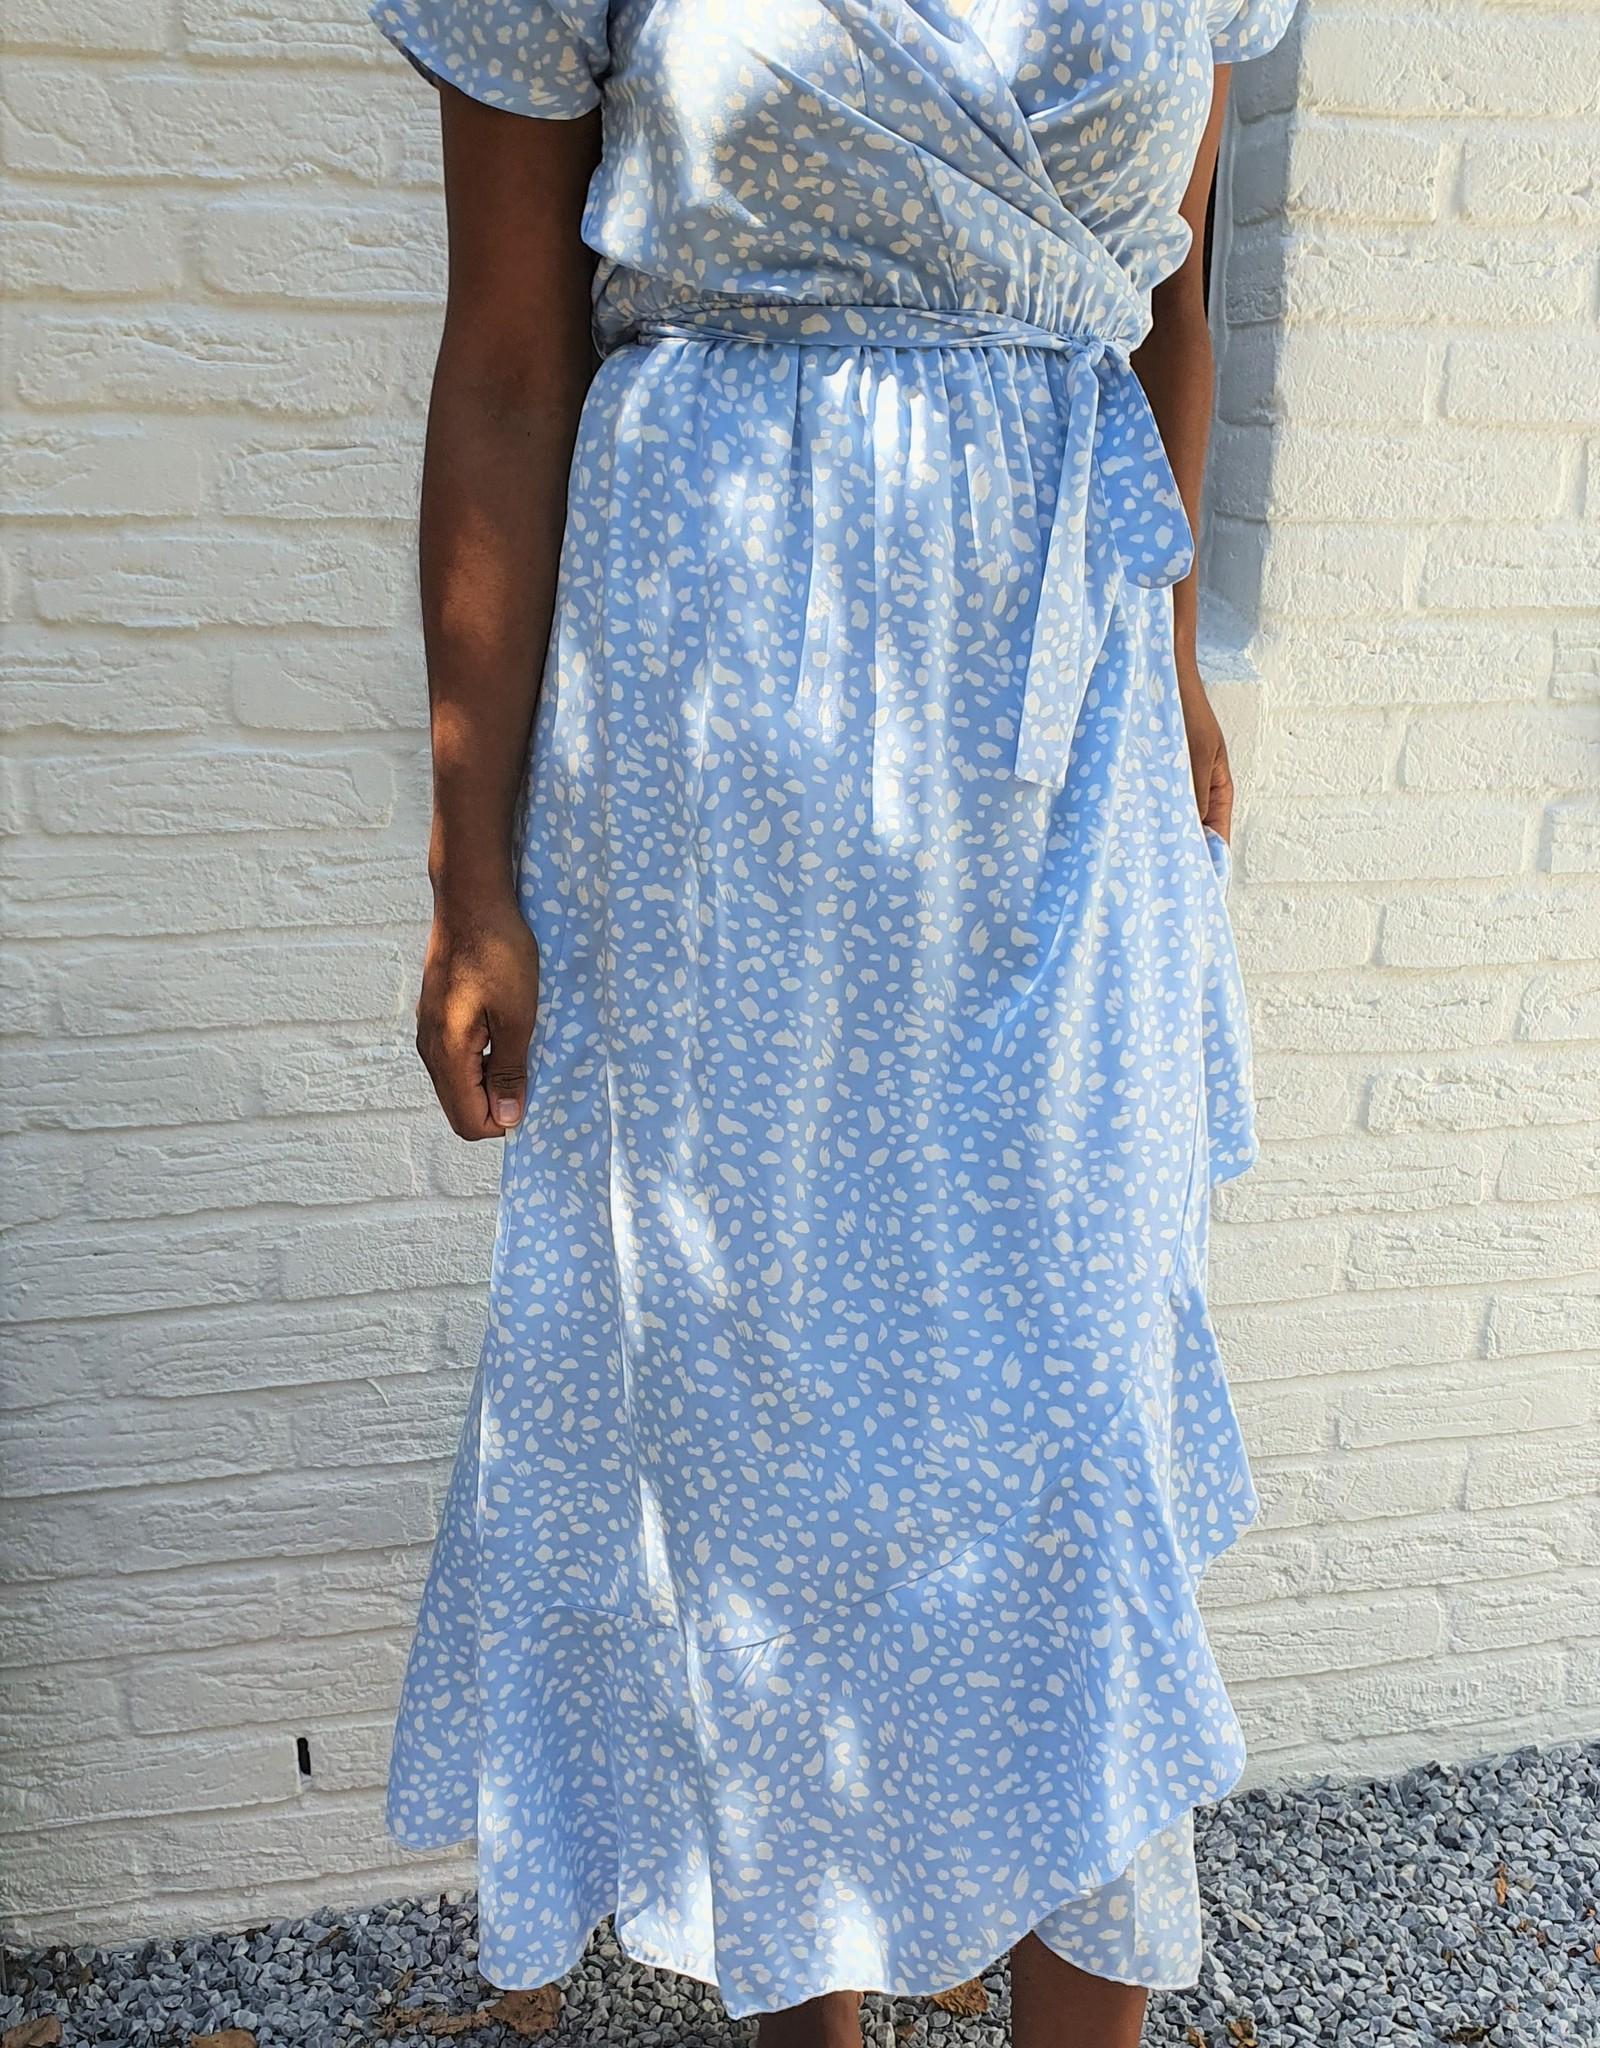 Thé babyblue leopard dress